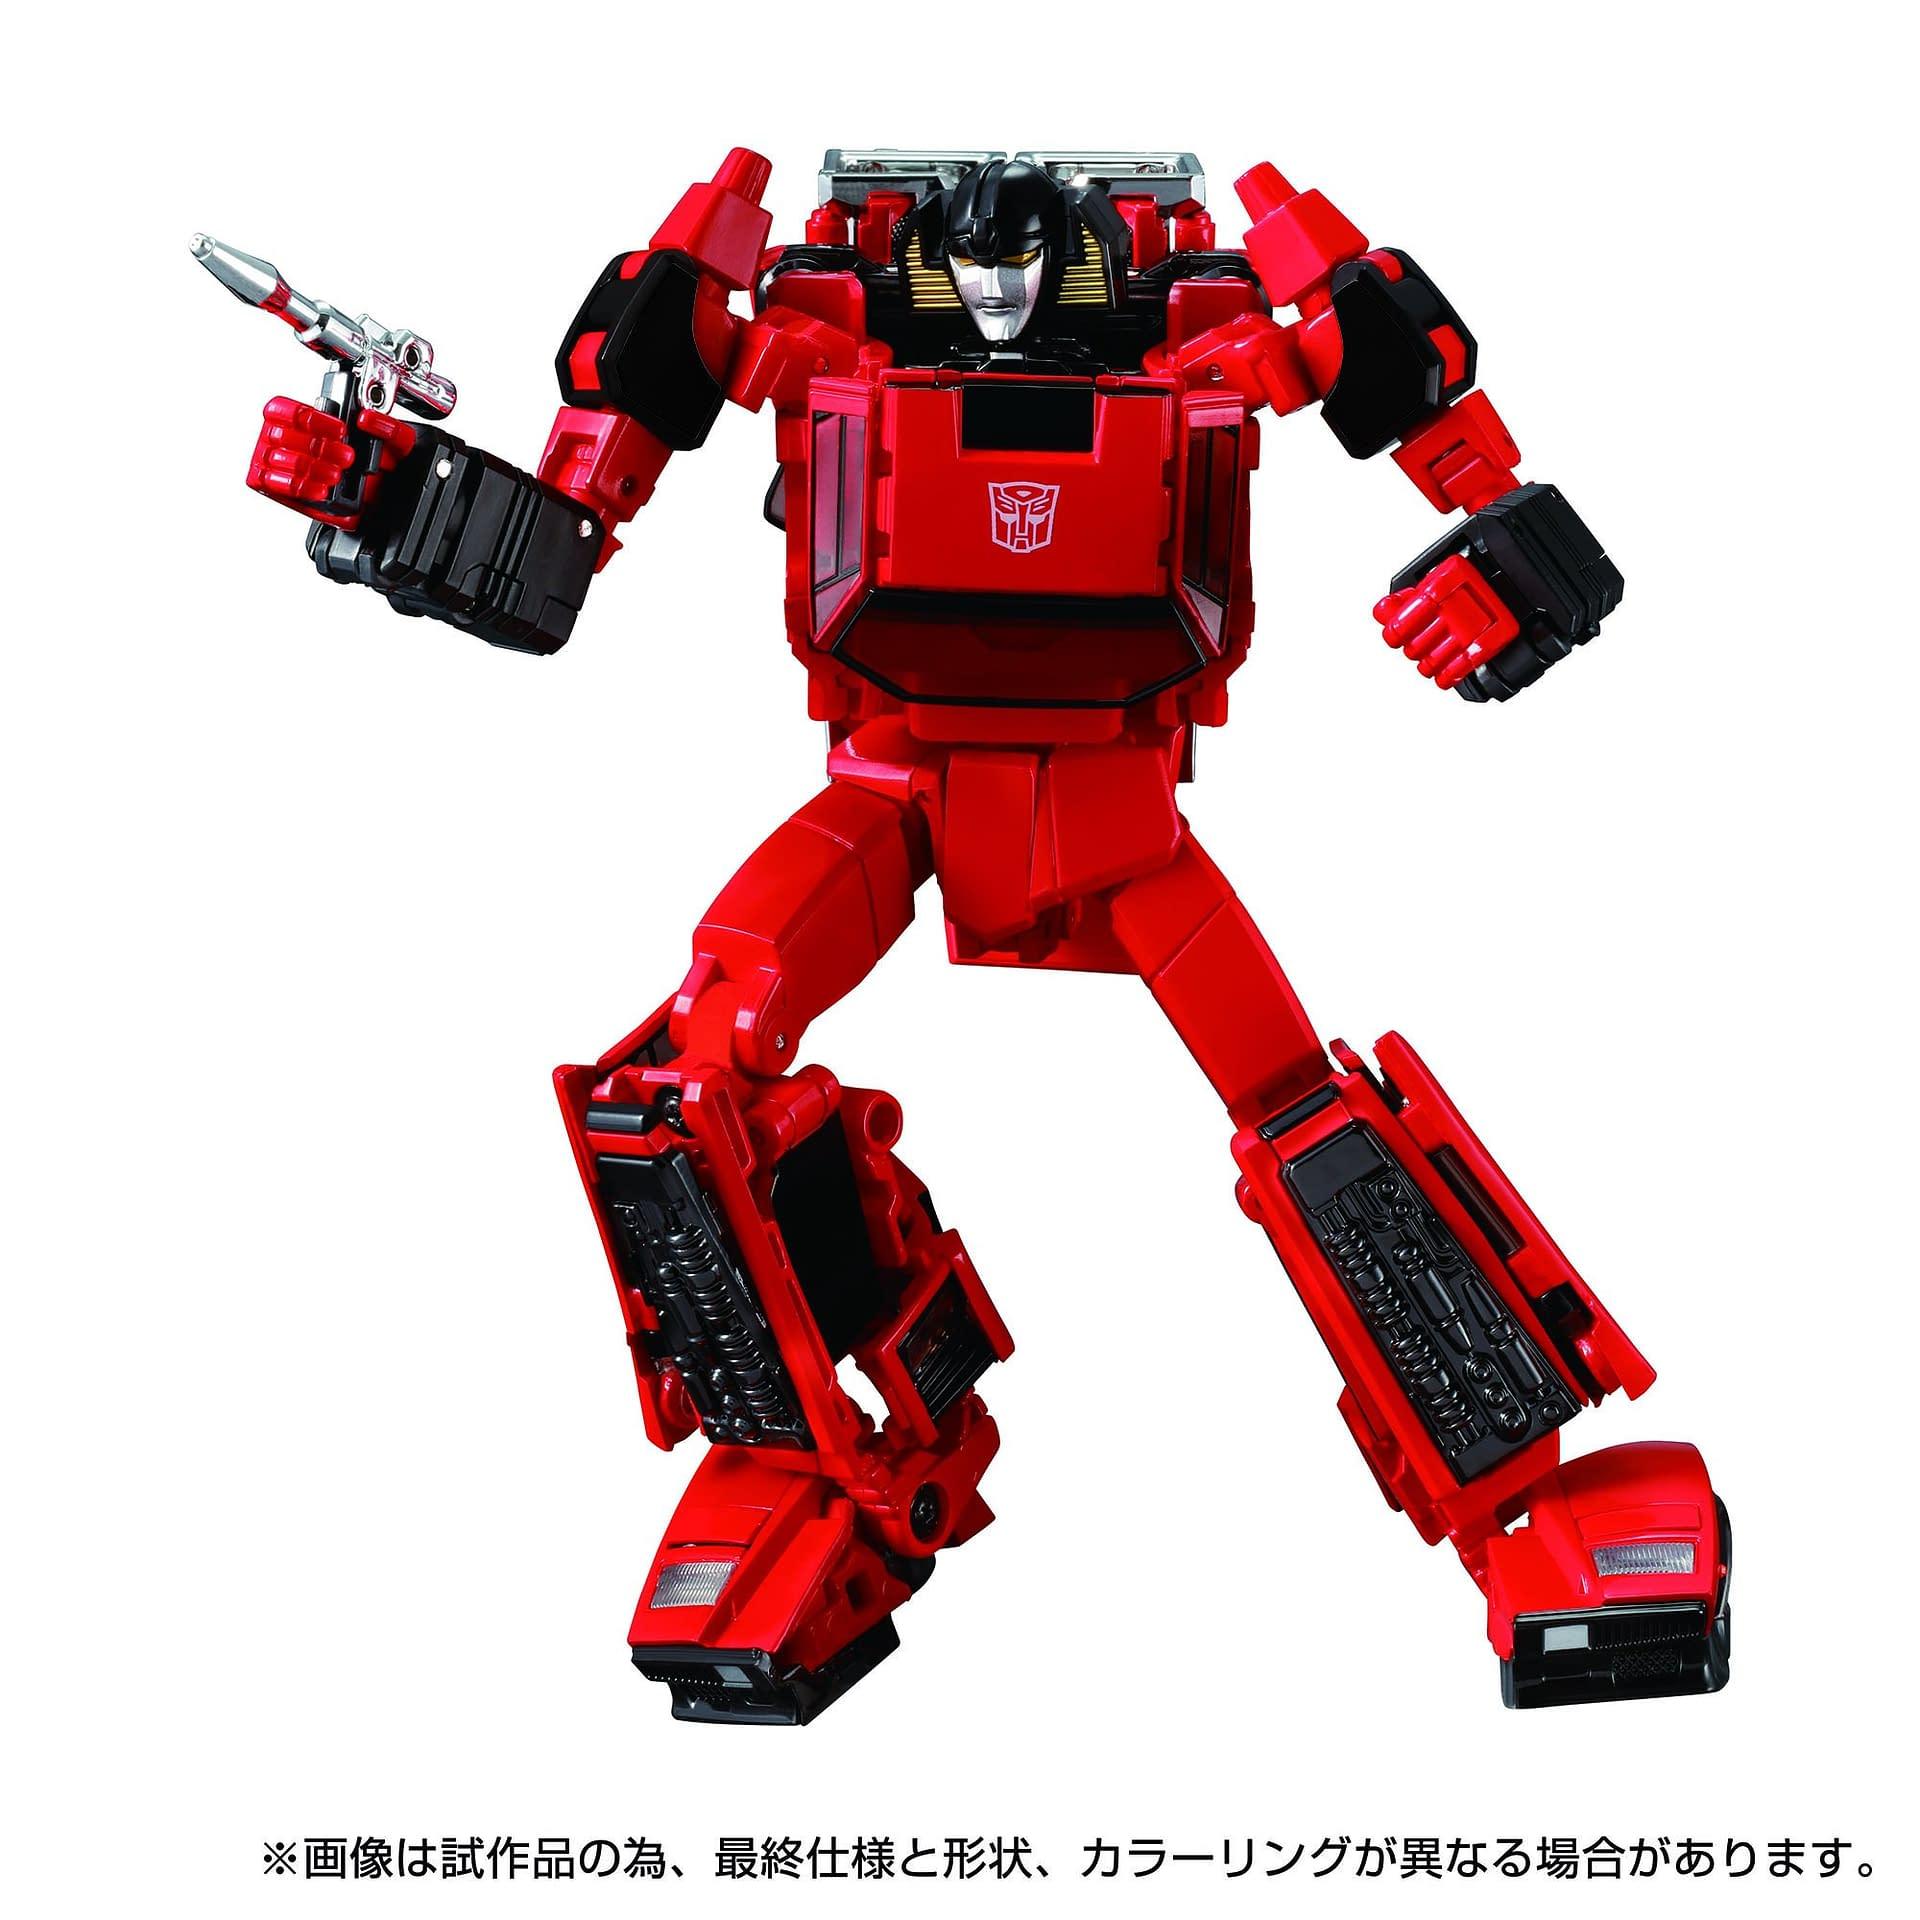 Transformers Takara Tomy Masterpiece MP-39 + Spinout Pré-commande $ 114.99